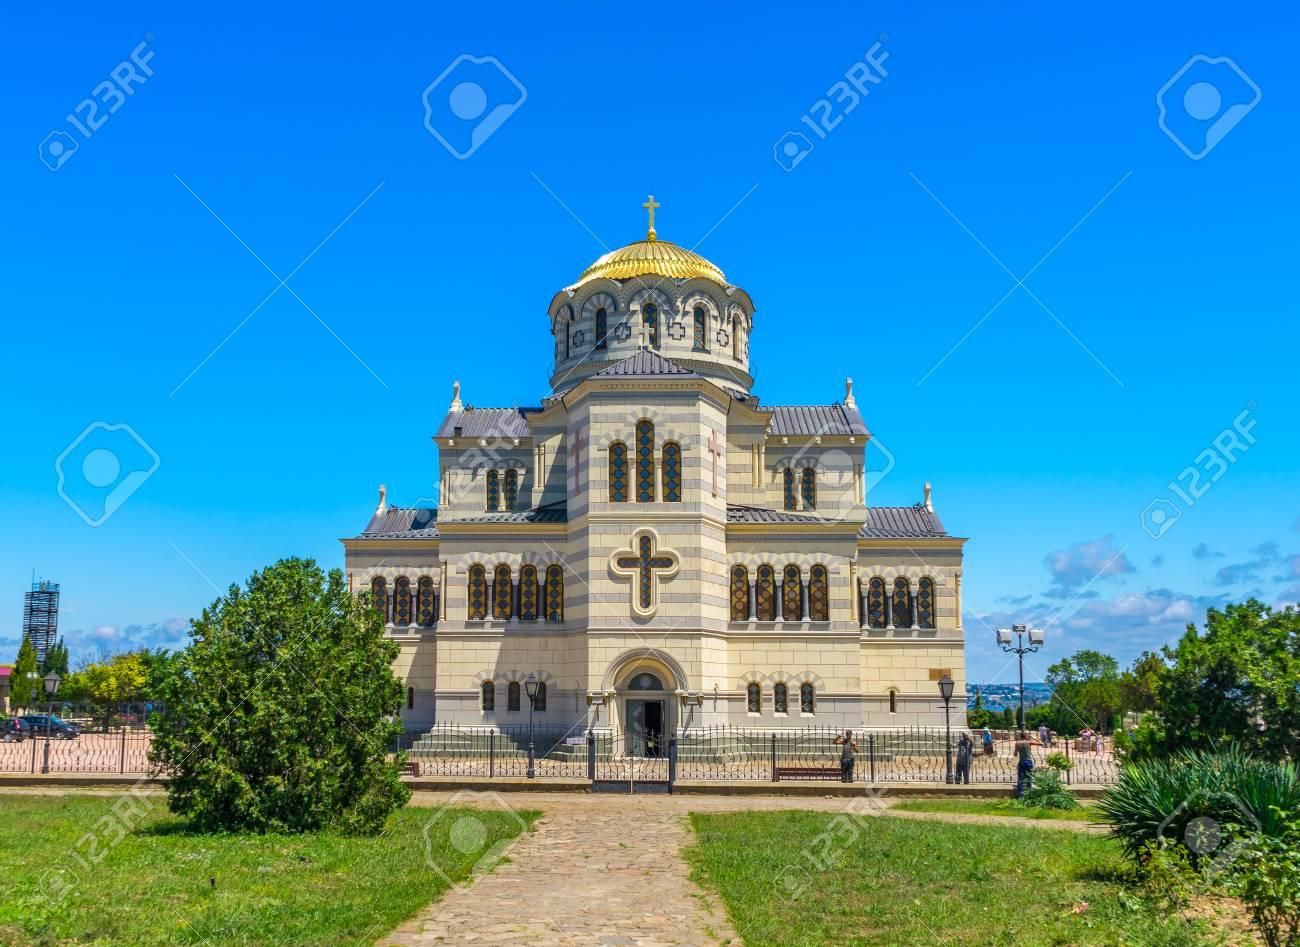 St. Vladimir's Cathedral (Sevastopol) in Russia